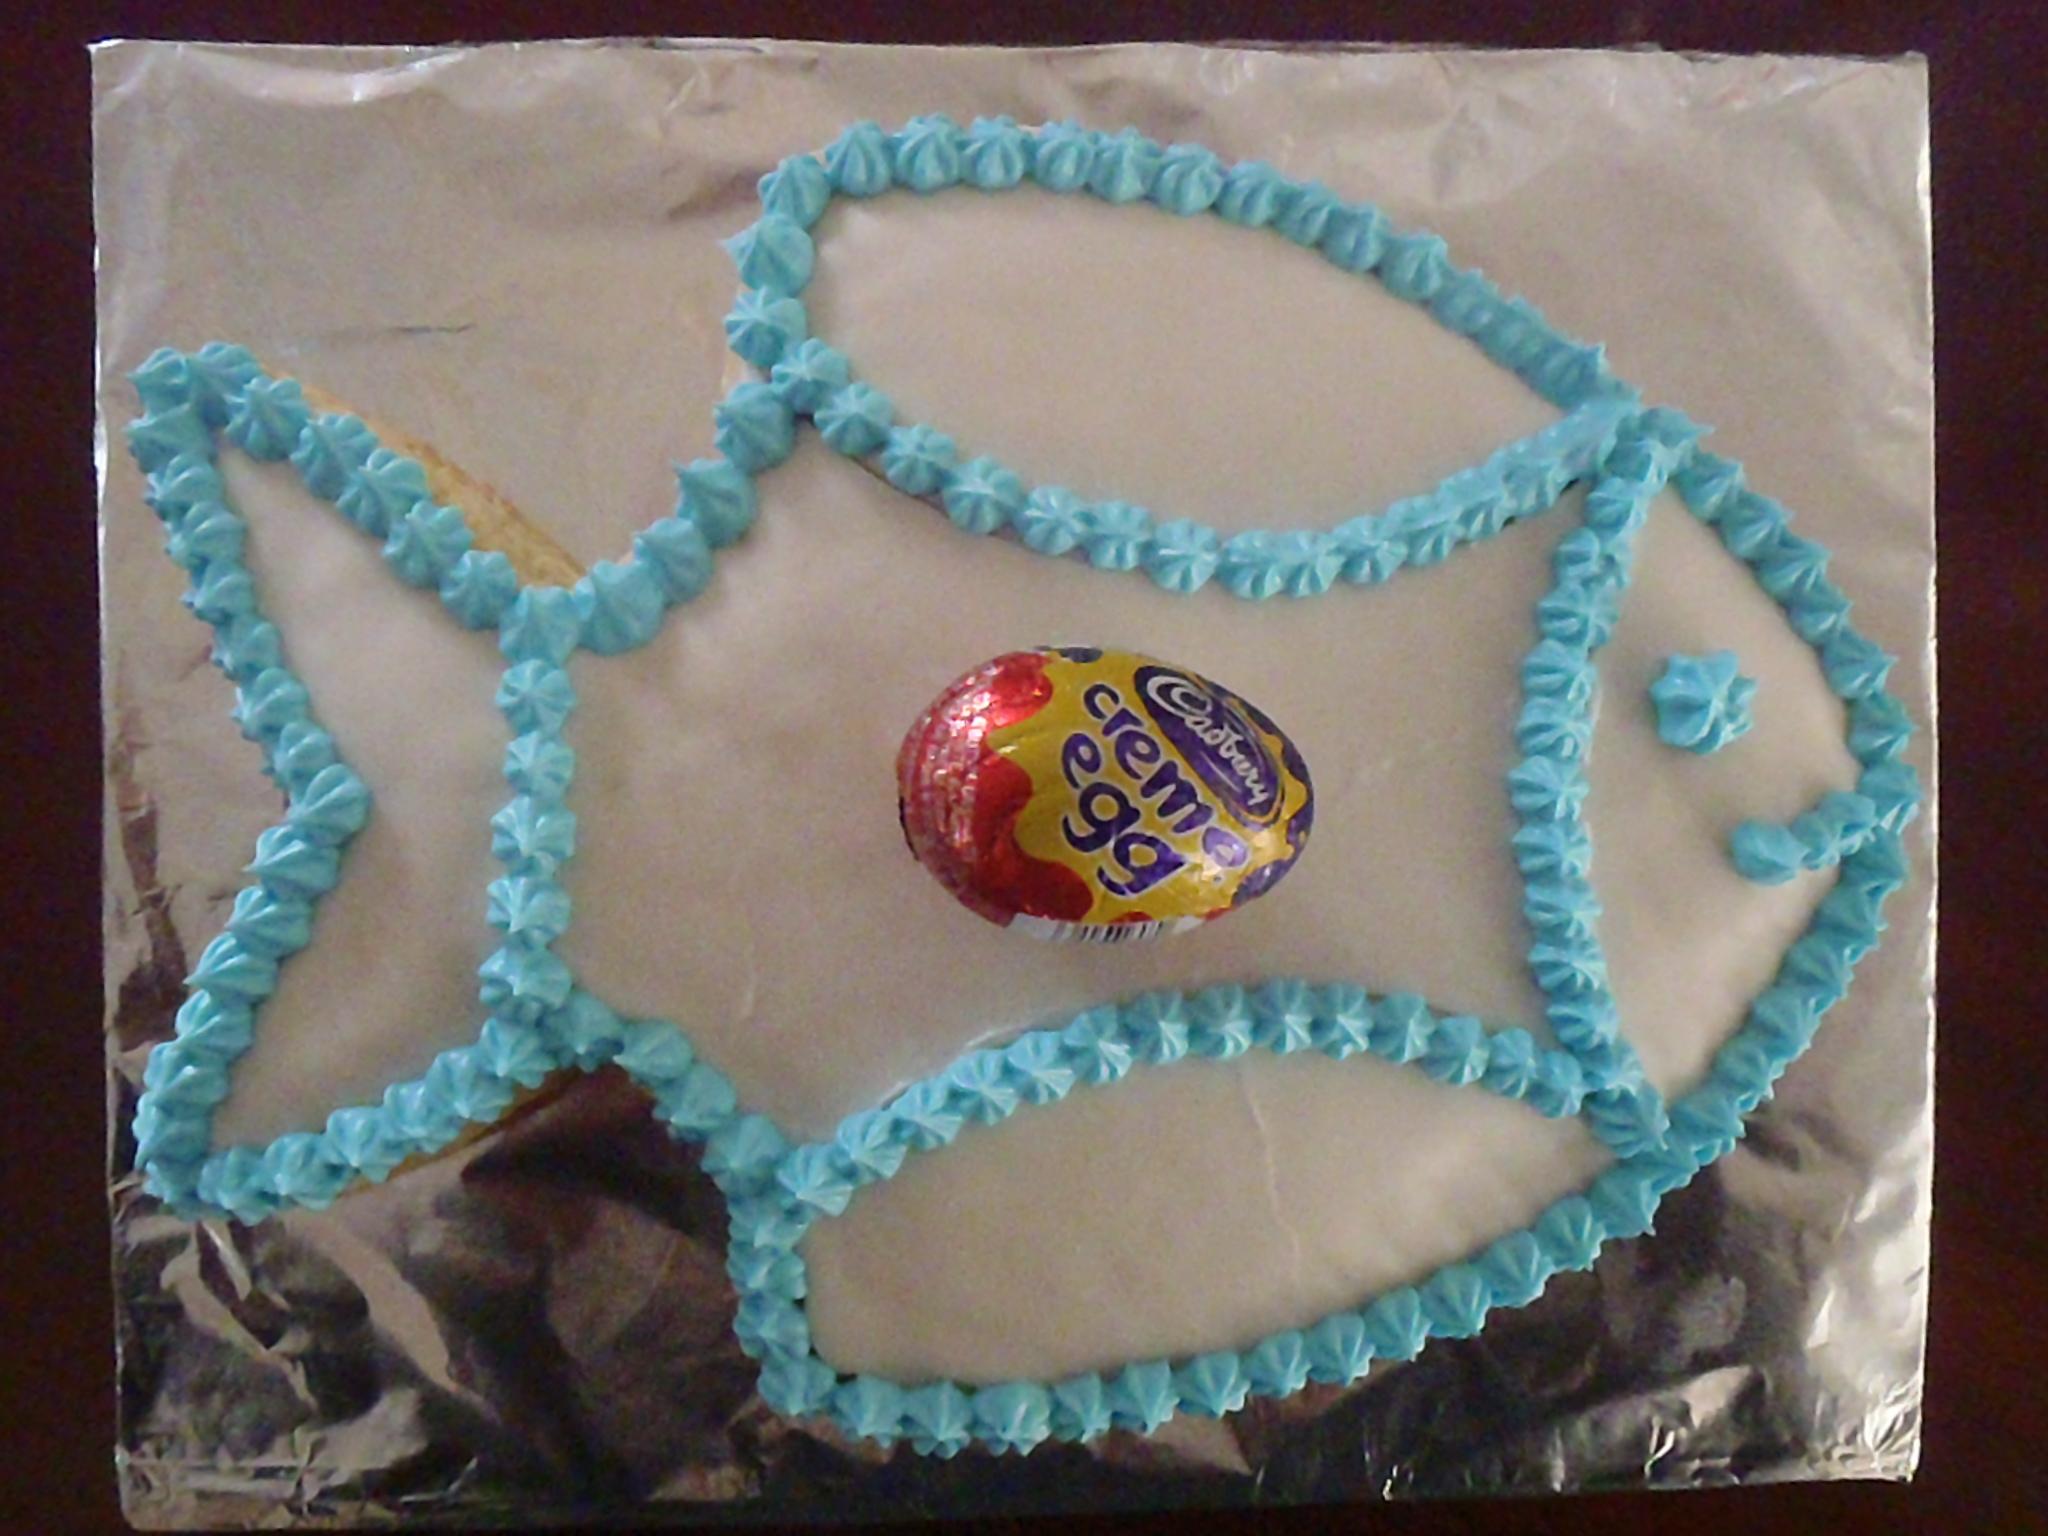 Marzipan Easter Cookies From Malta (Figolla) Recipes — Dishmaps